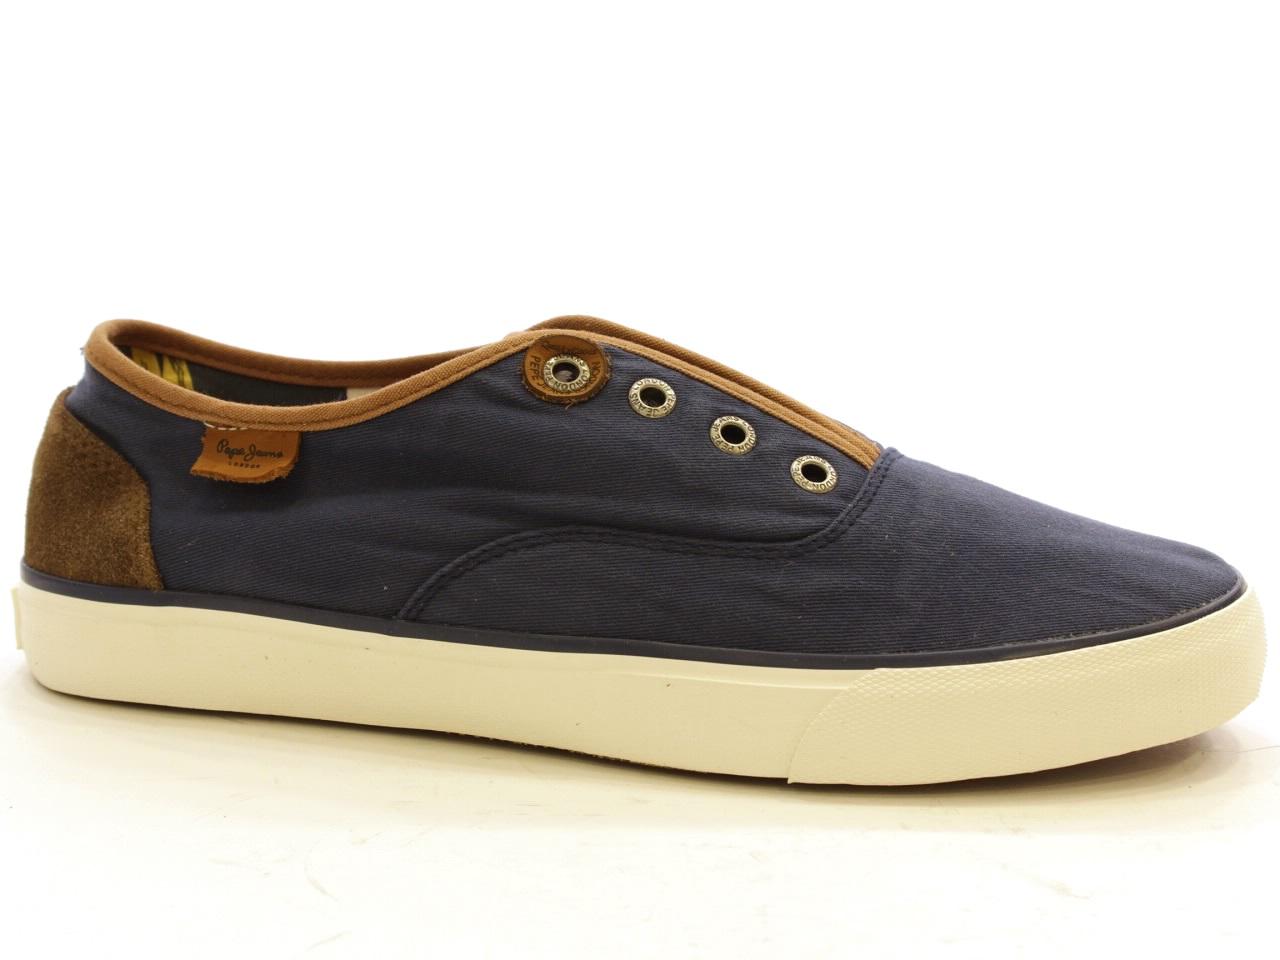 Sapatilhas, Ténis e Alpercatas Pepe Jeans - 608 HR-291